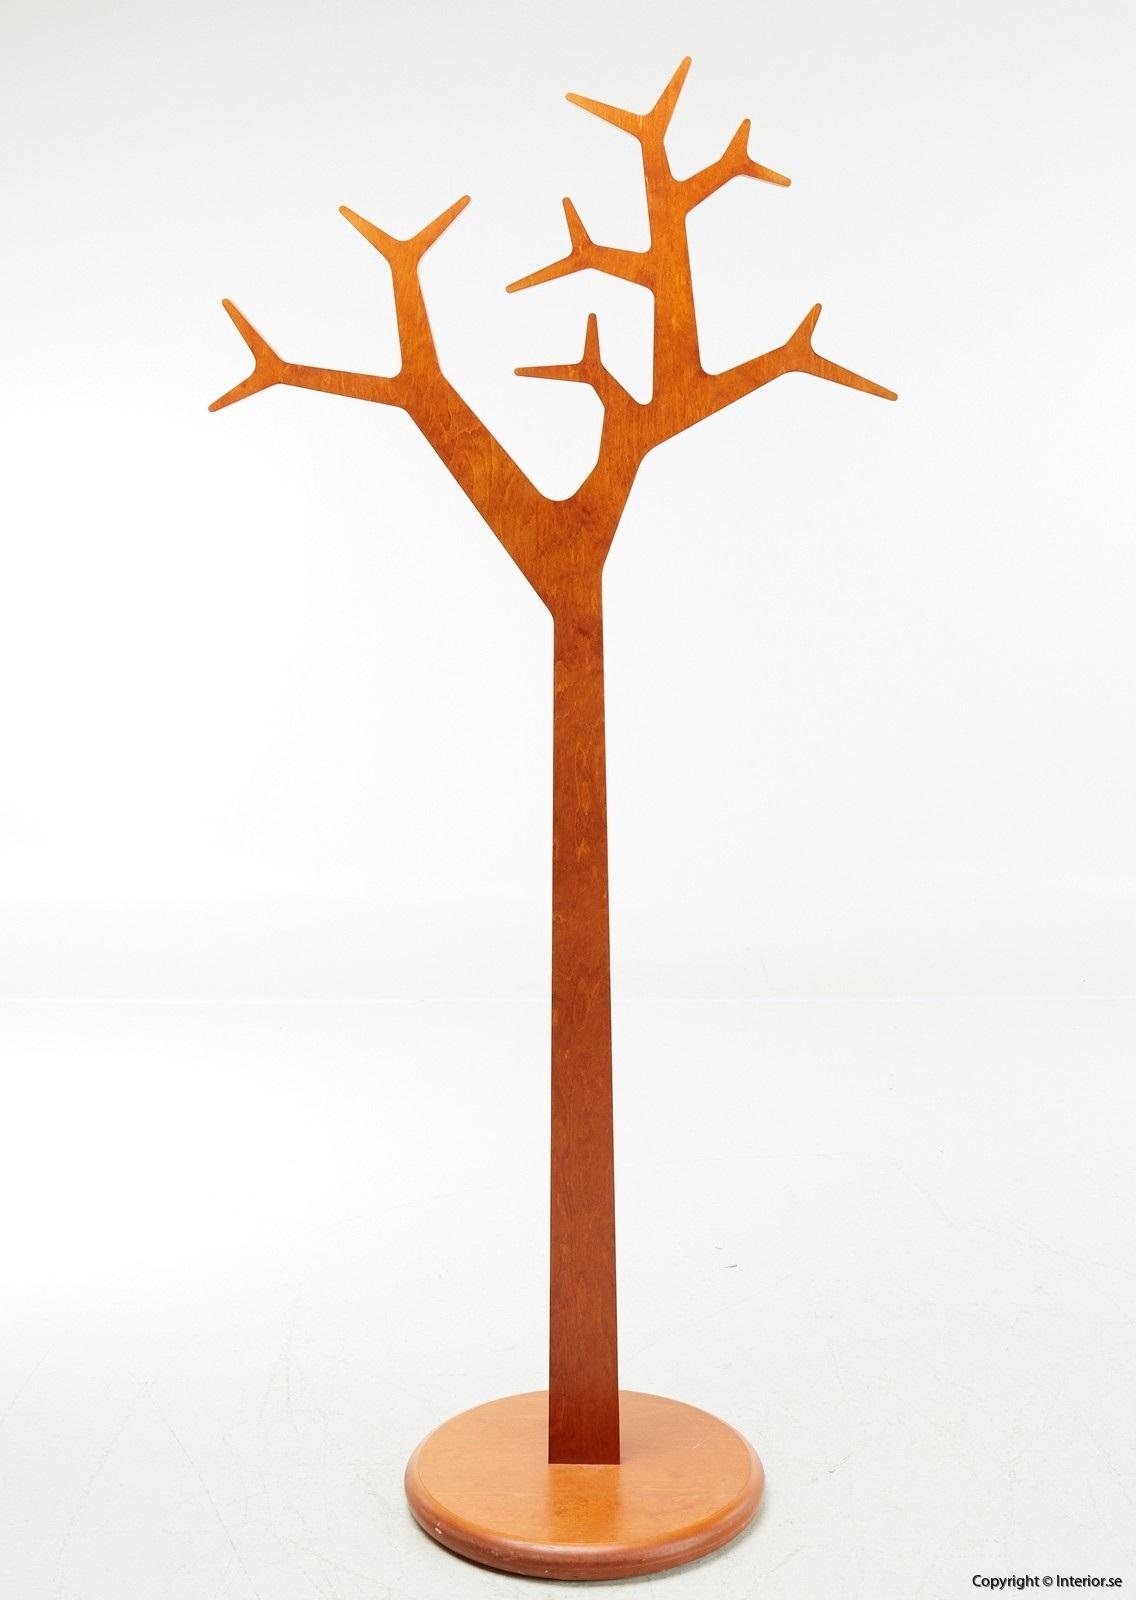 1 Klädhängare Michael Young Katrin Petursdottir Swedese Tree Ek (4)